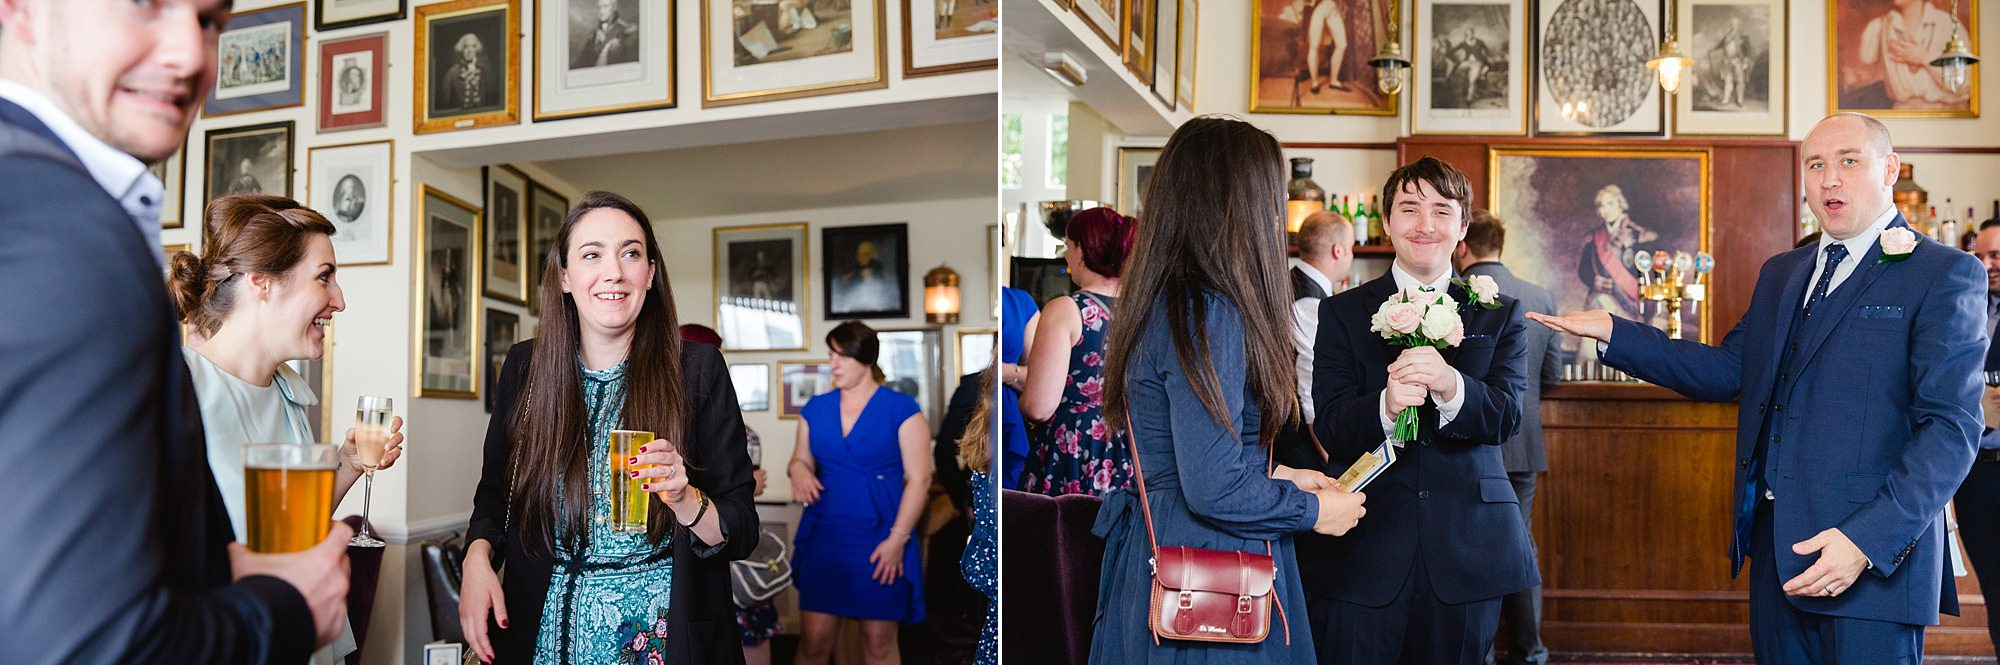 Trafalgar Tavern wedding guests enjoying reception